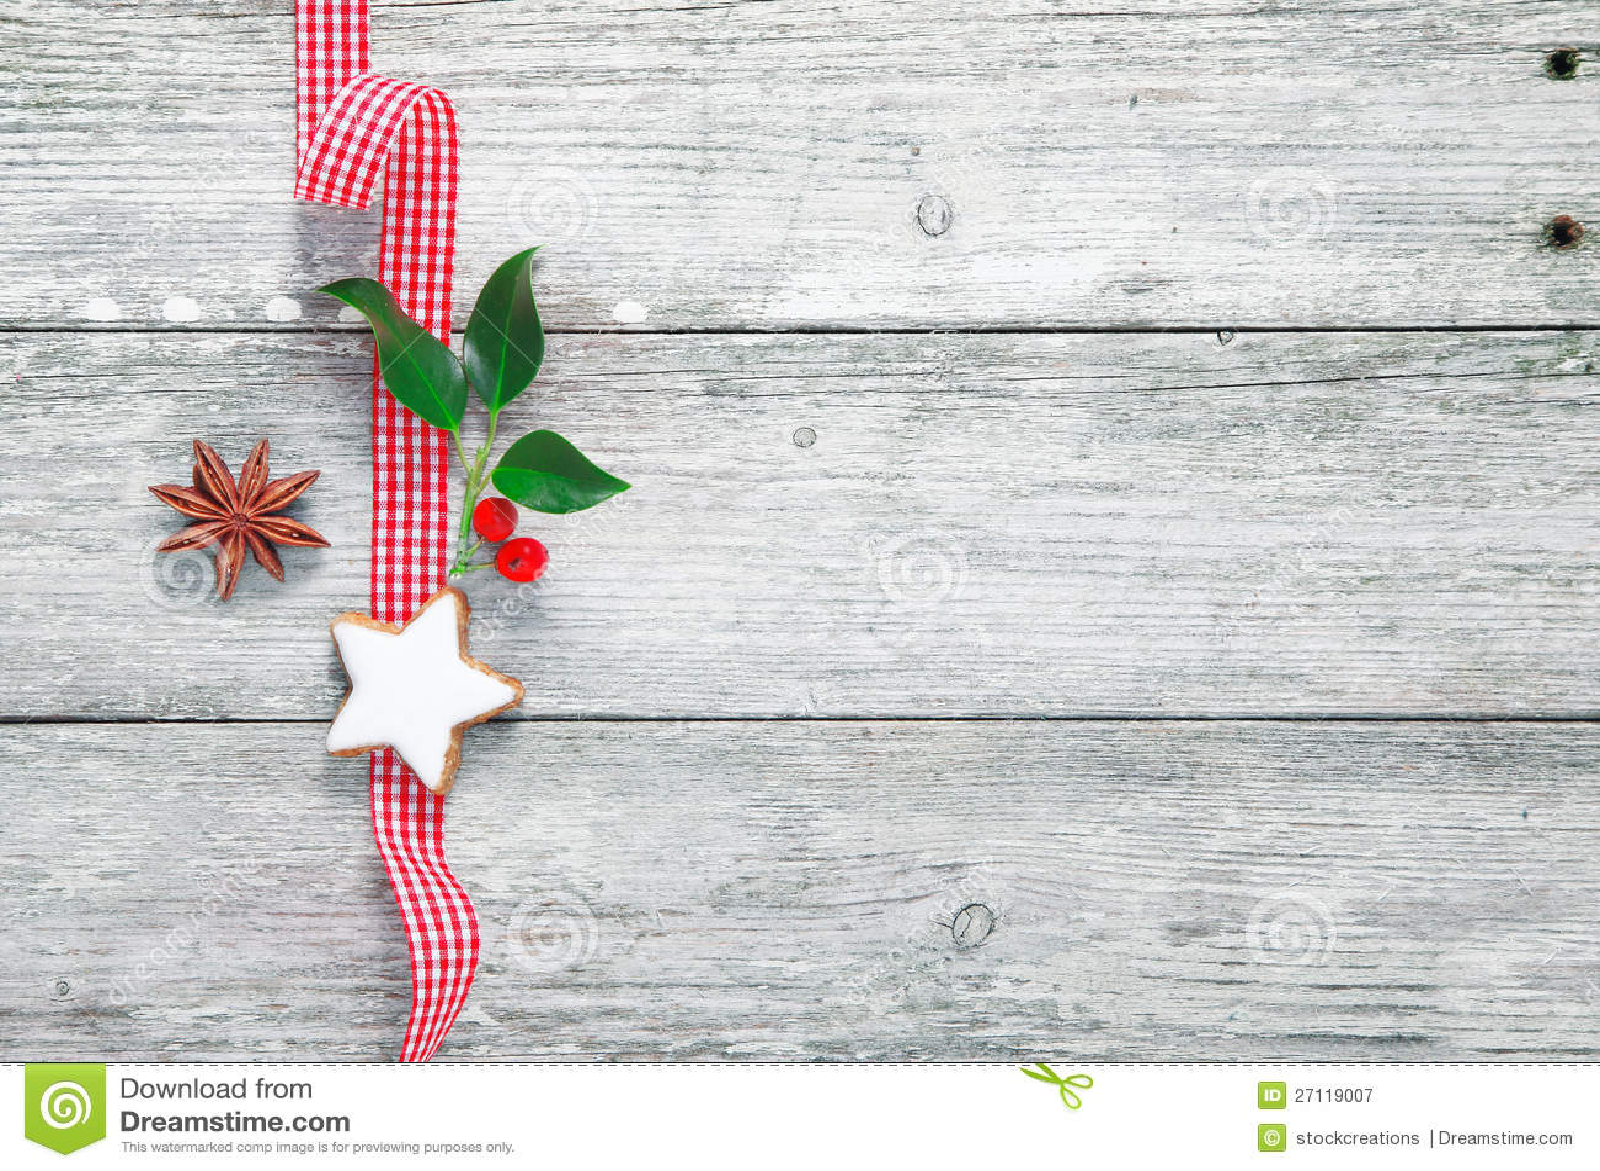 Vintage Christmas Decoration Stock Image - Image: 27119007